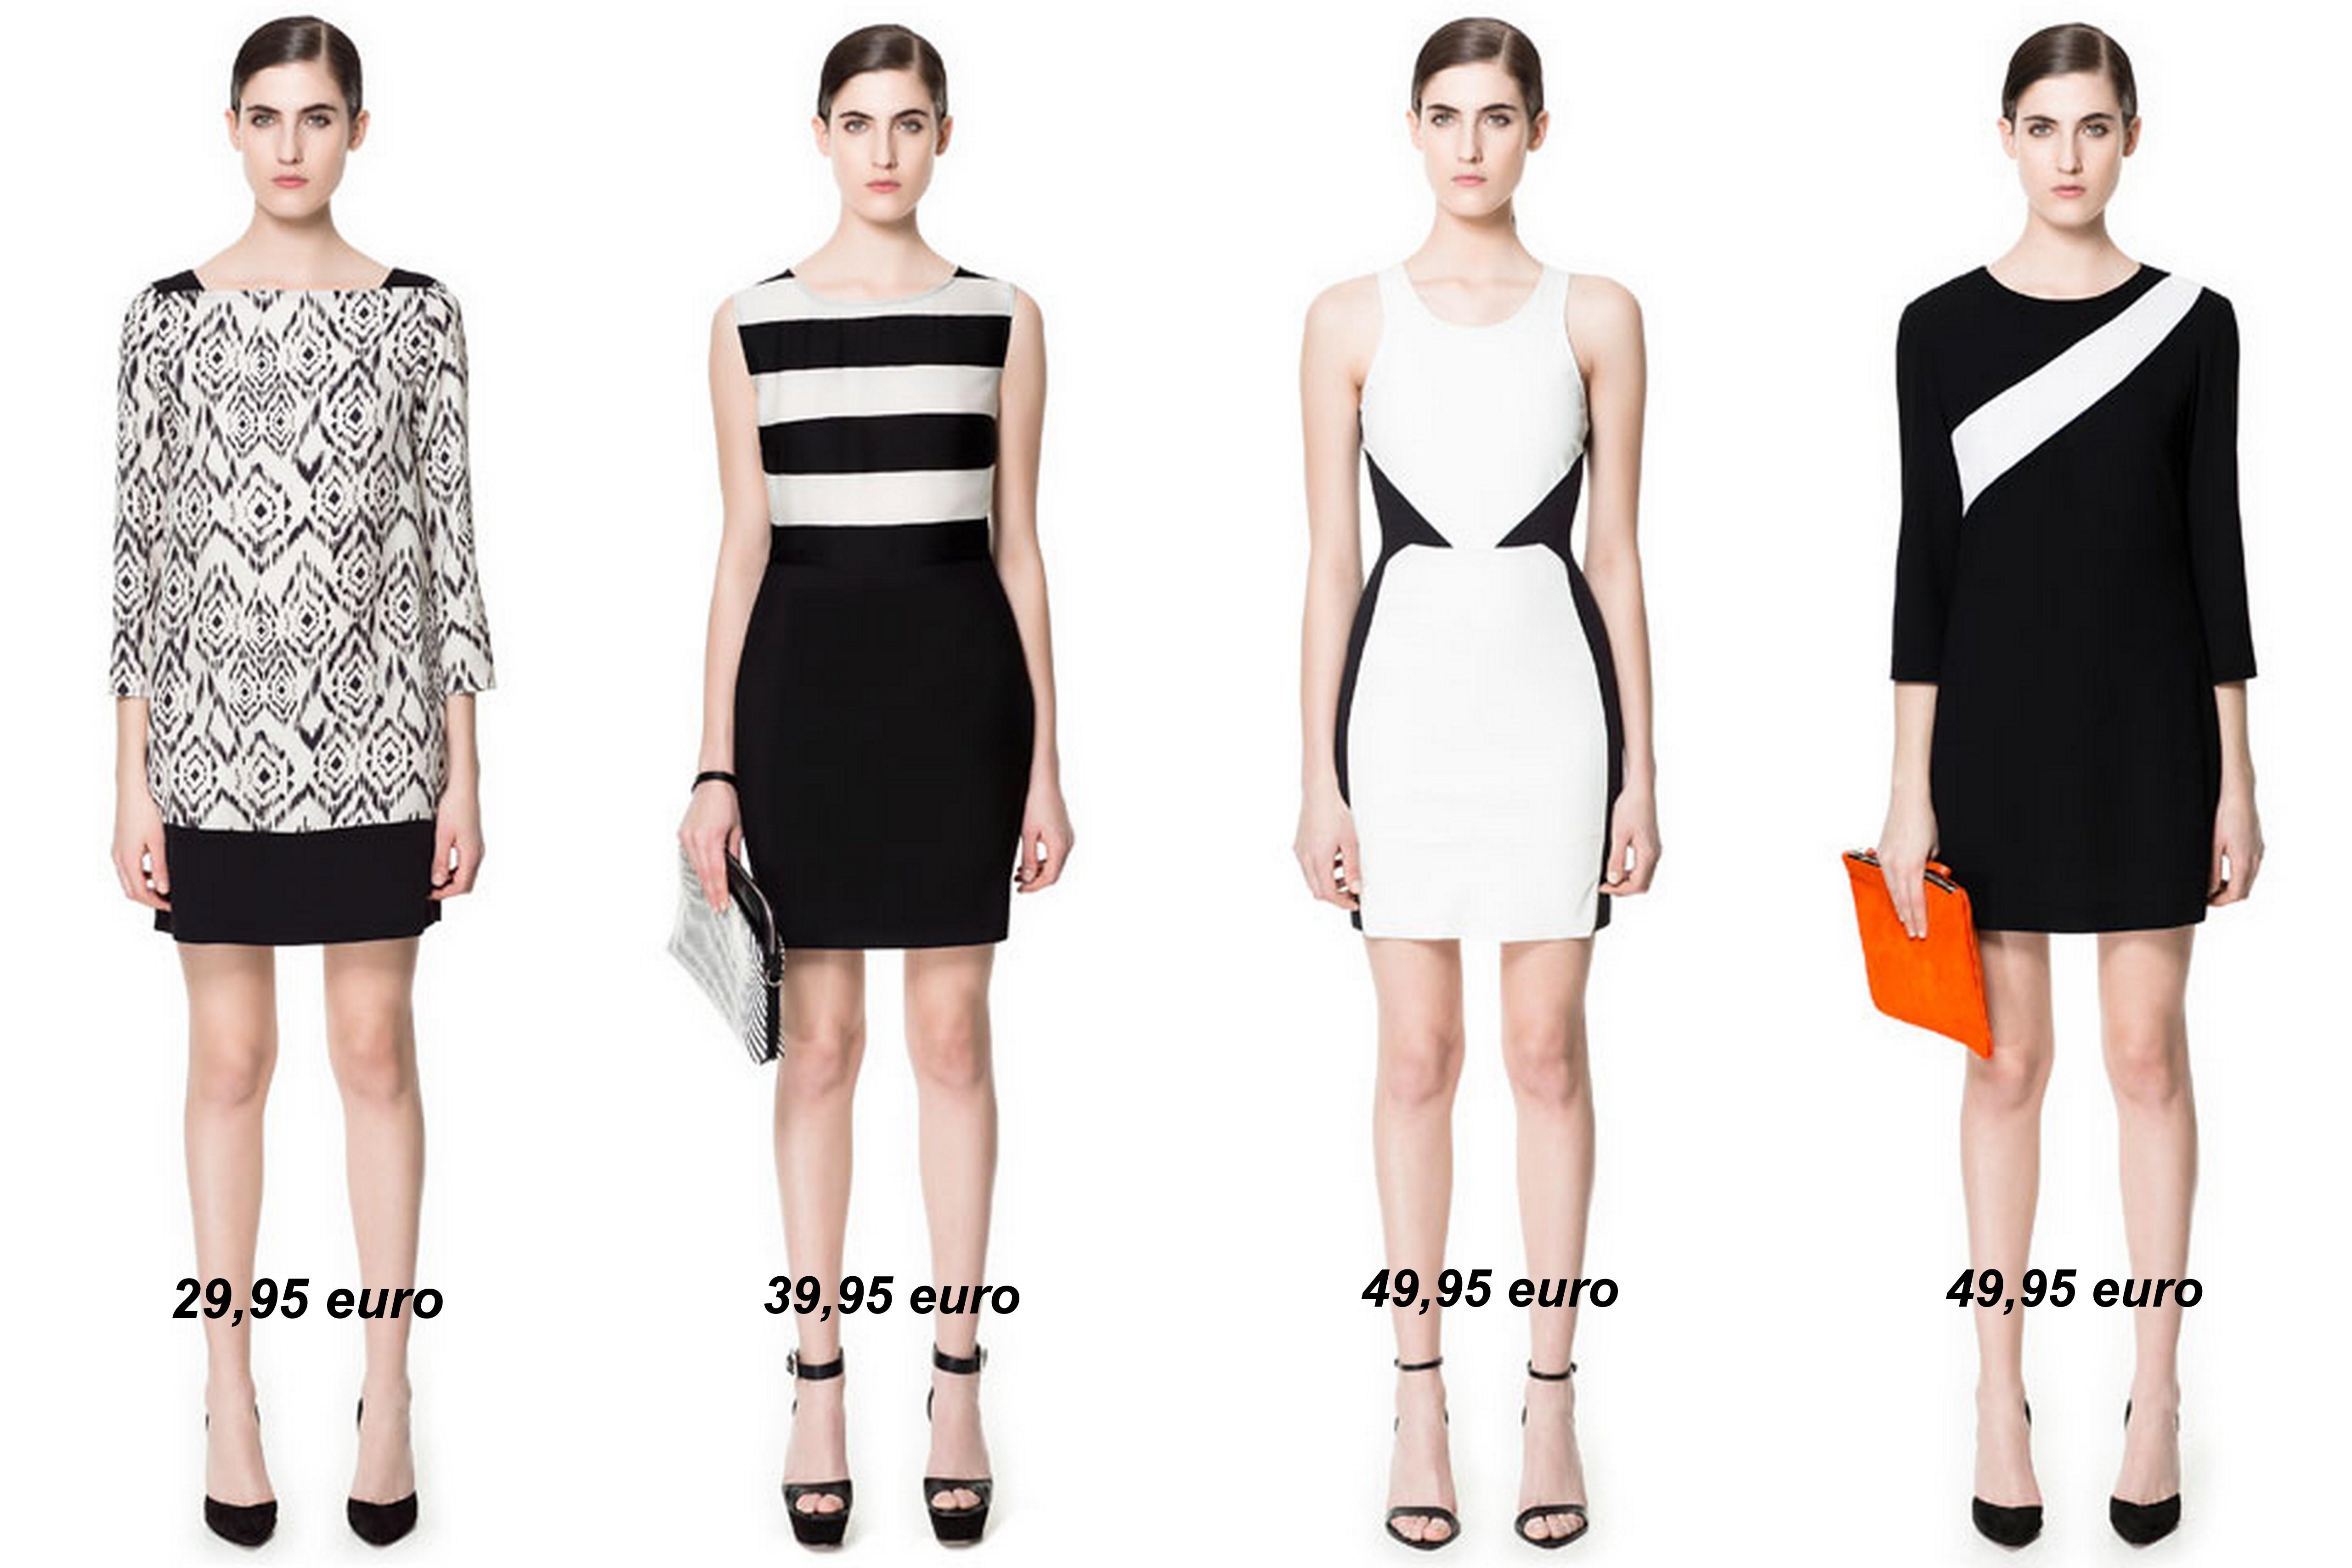 kleedjes zwart wit